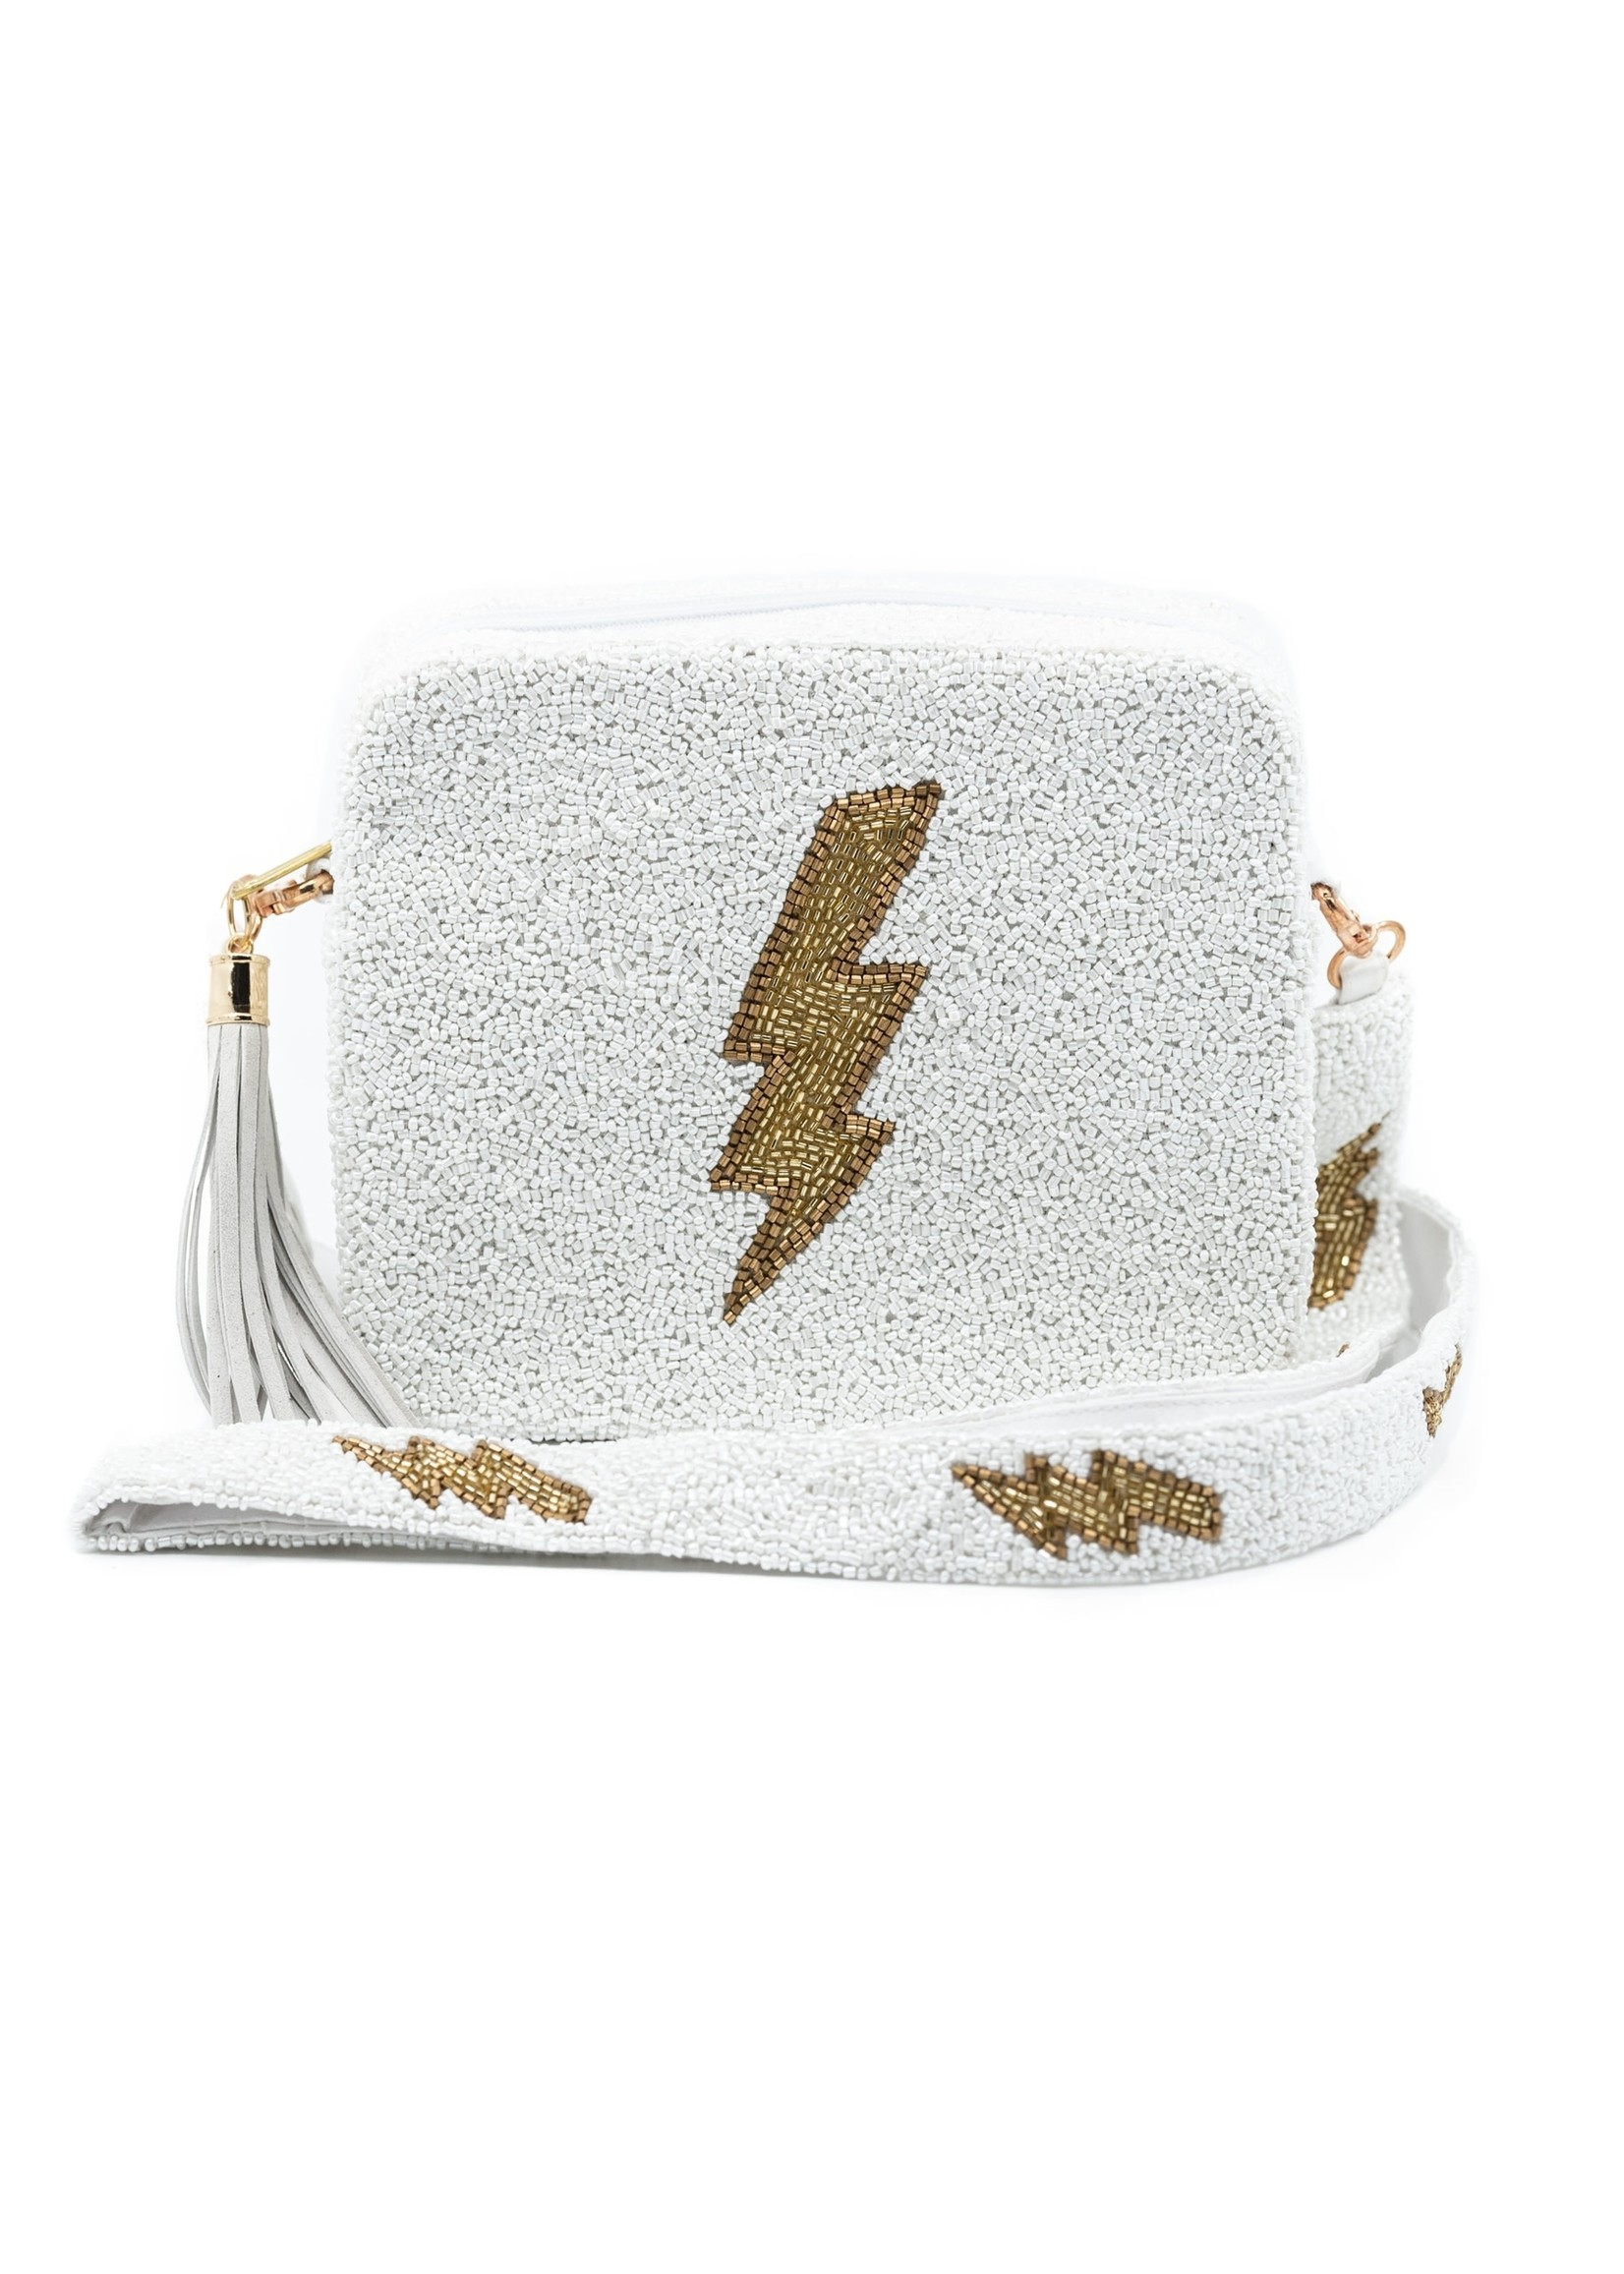 Tiana Designs White Lightening Bolt Purse